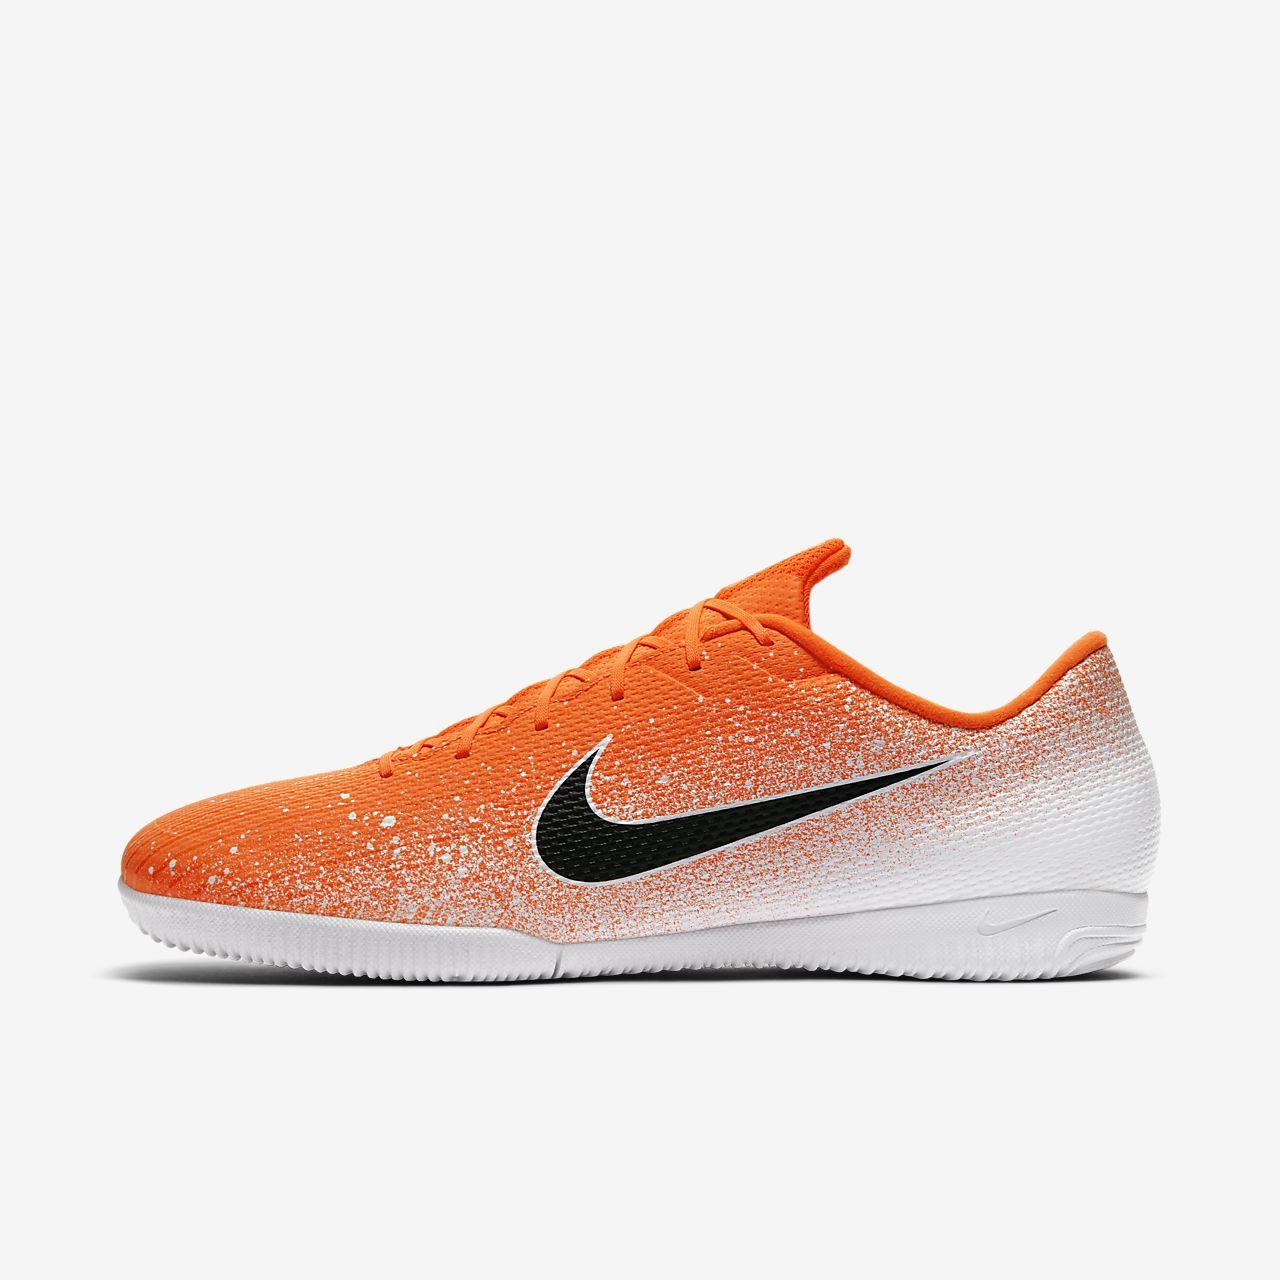 cc85ebdc16c Nike VaporX 12 Academy IC Indoor Court Football Shoe. Nike.com GB